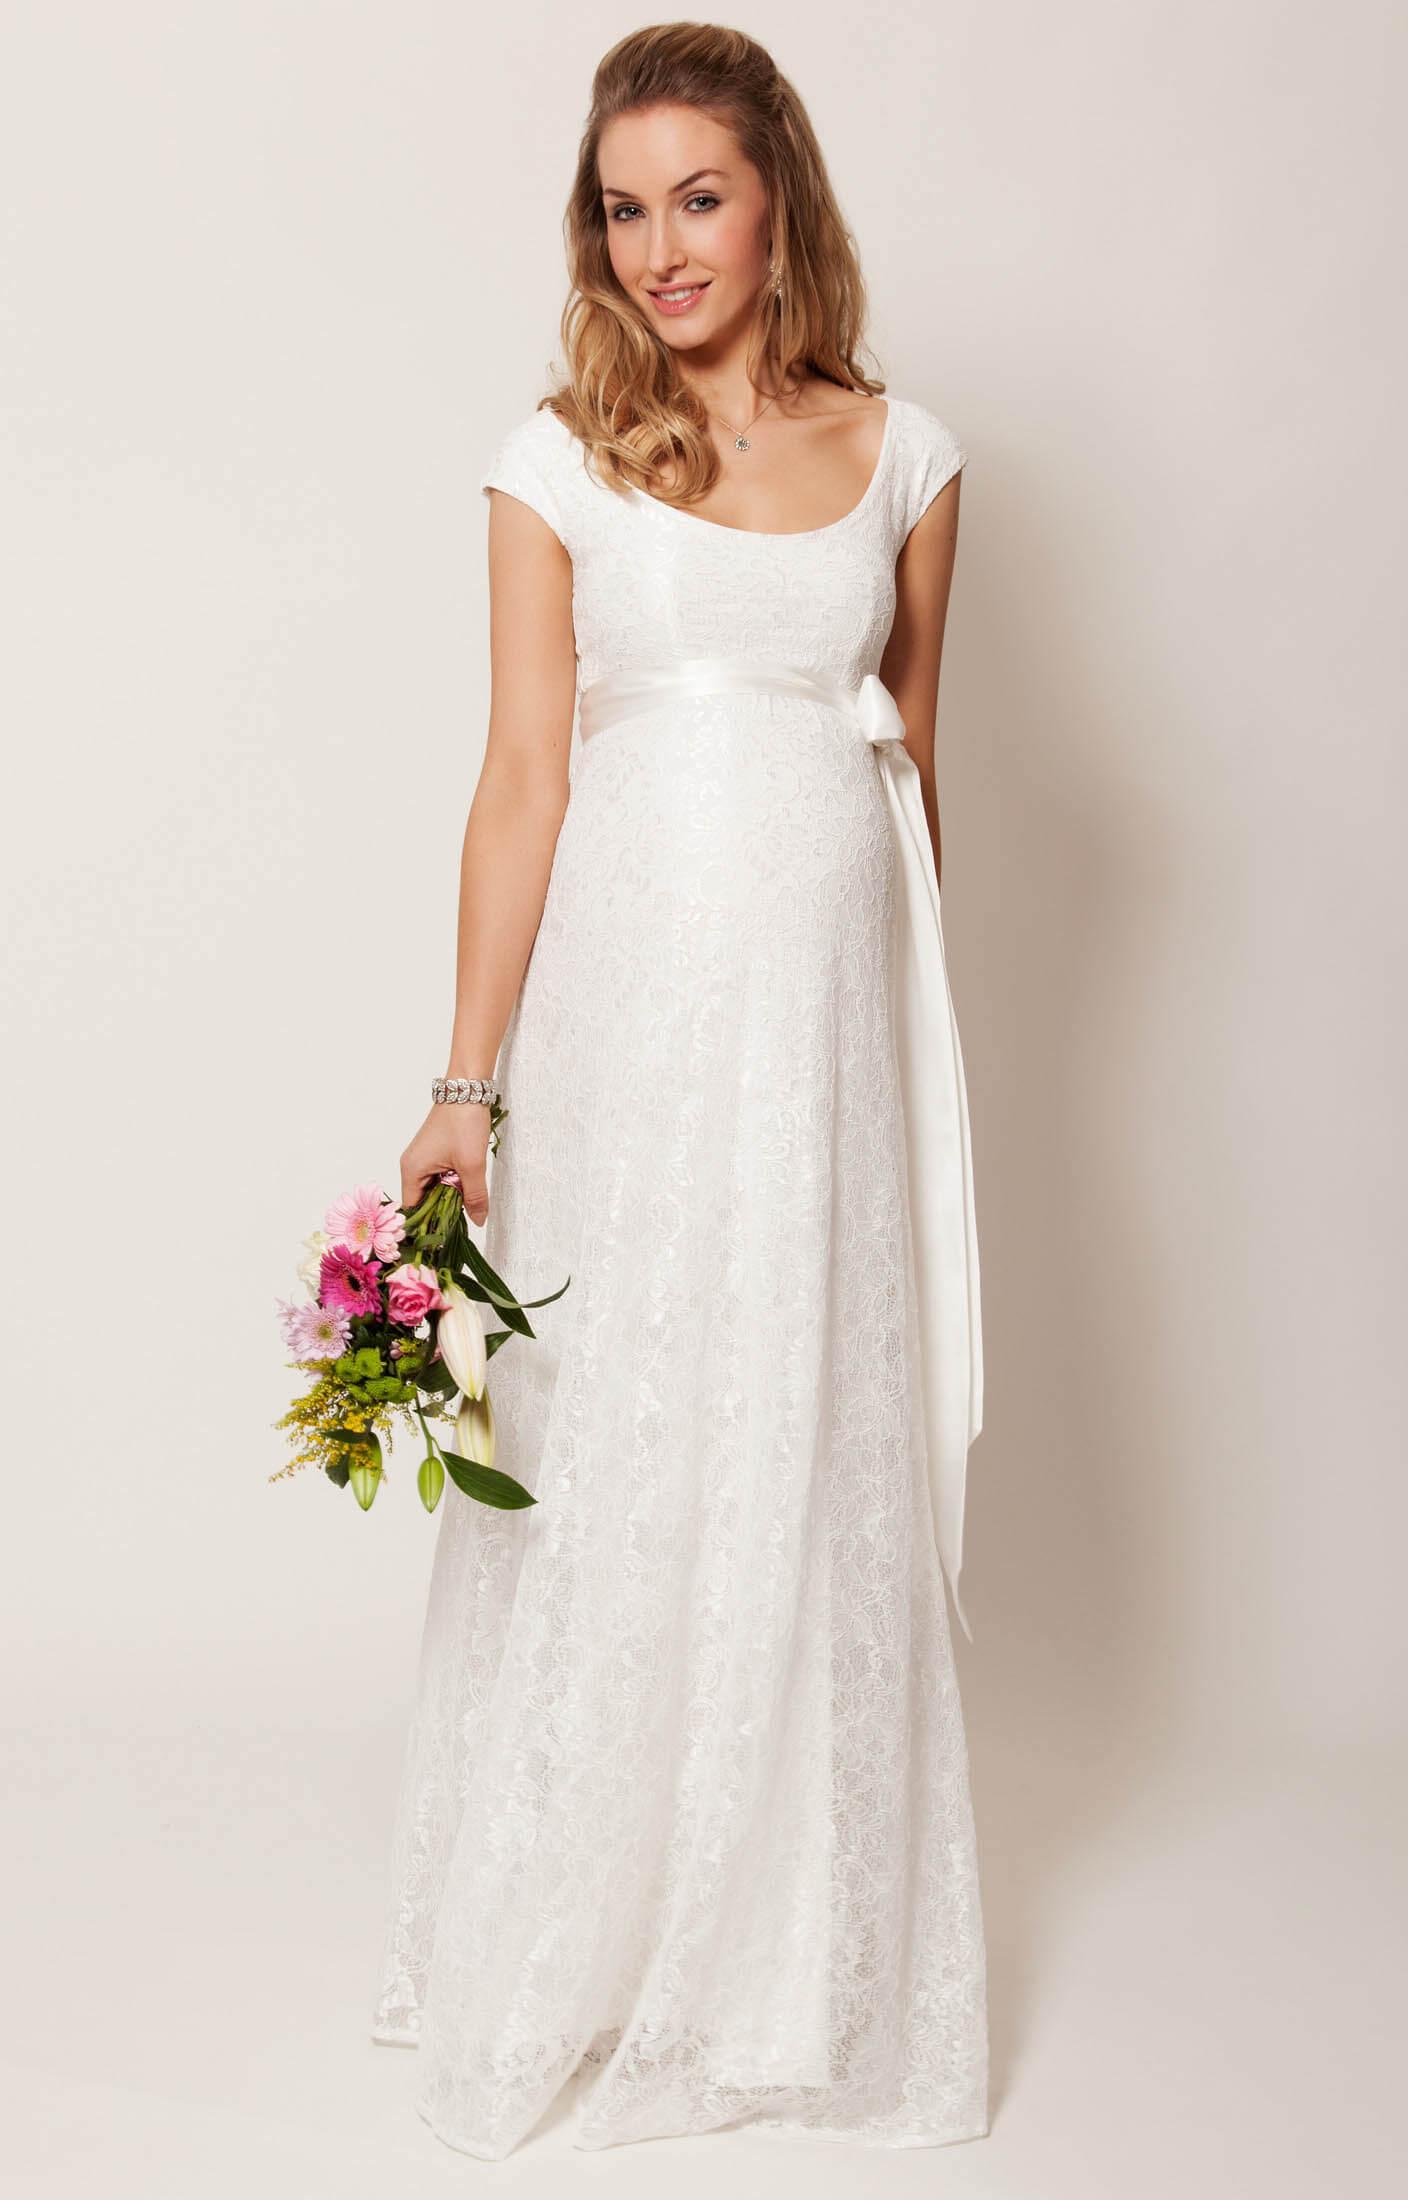 Eliza maternity wedding gown long ivory maternity for Ivory maternity wedding dresses